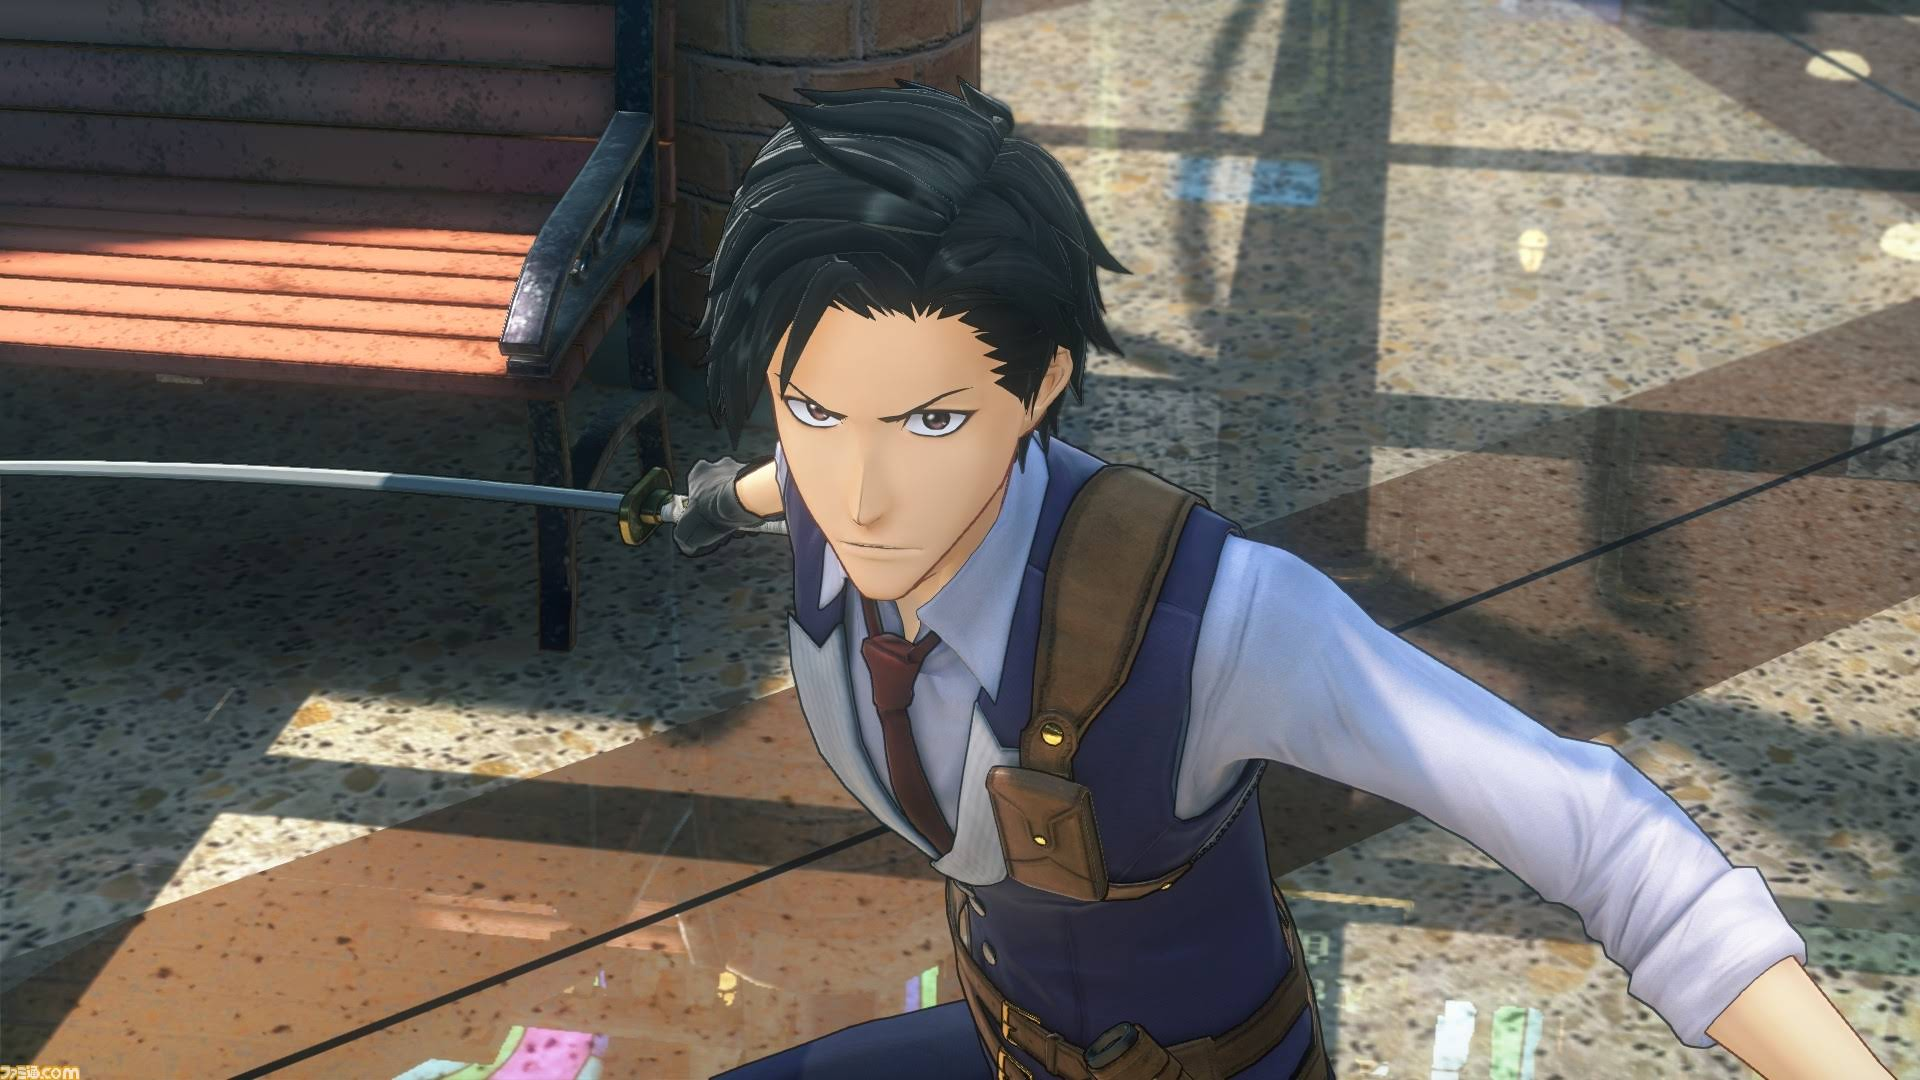 TGS 2019 | ویدئوی جدیدی از گیمپلی بازی Project Sakura Wars منتشر شد